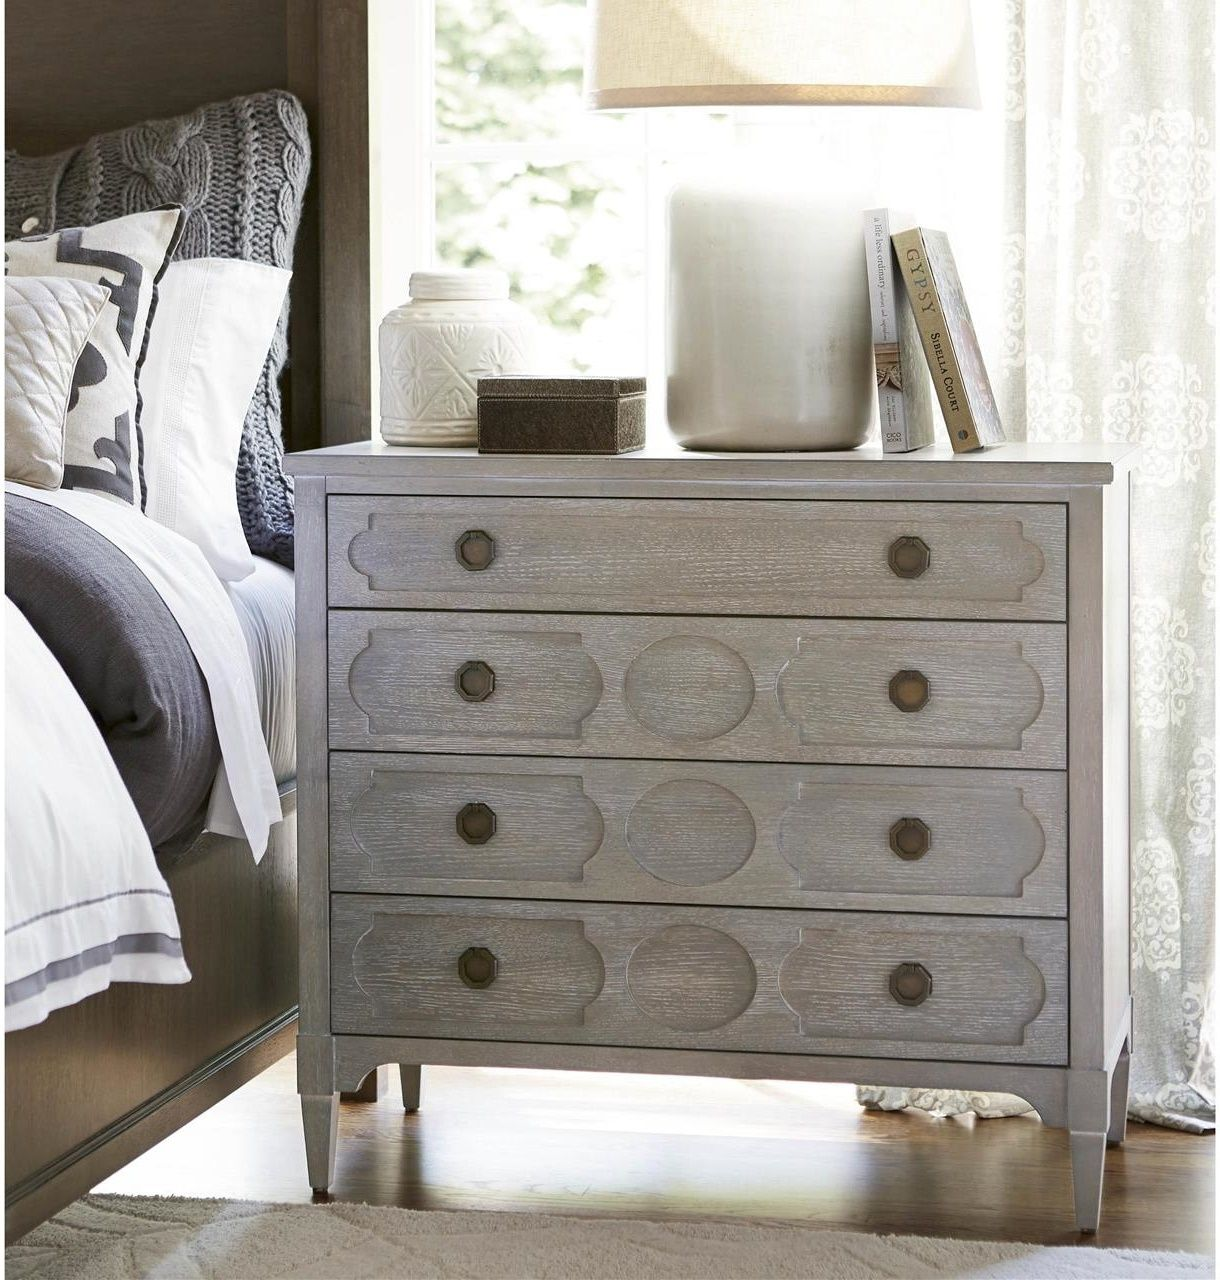 Playlist Vintage Grey Oak 4 Drawers Chest In 2021 Universal Furniture Furniture Bedroom Furniture [ 1280 x 1220 Pixel ]